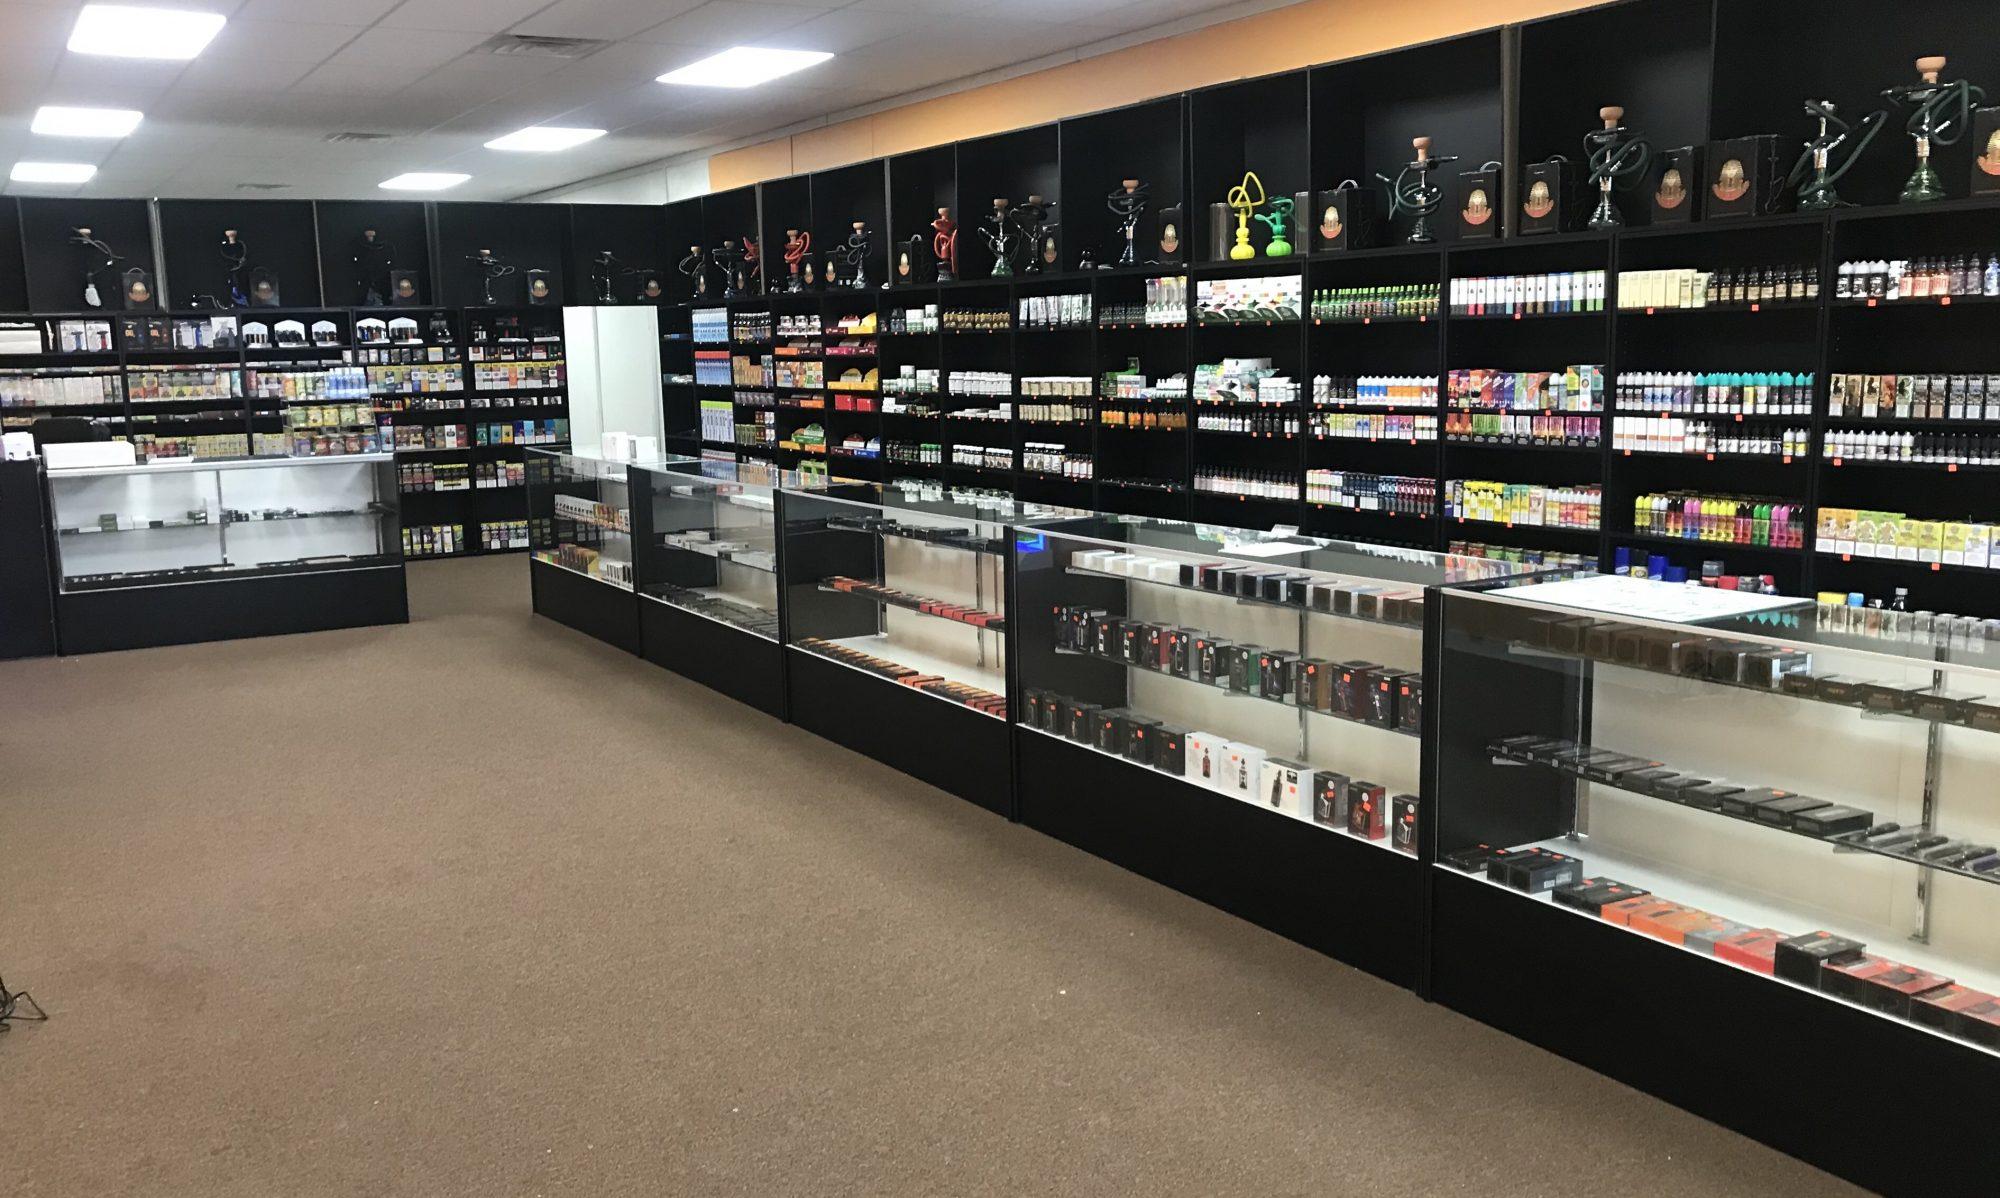 Olathe Vape Shop | Vaporizers, E-Cigarettes, and Vaping Supplies For